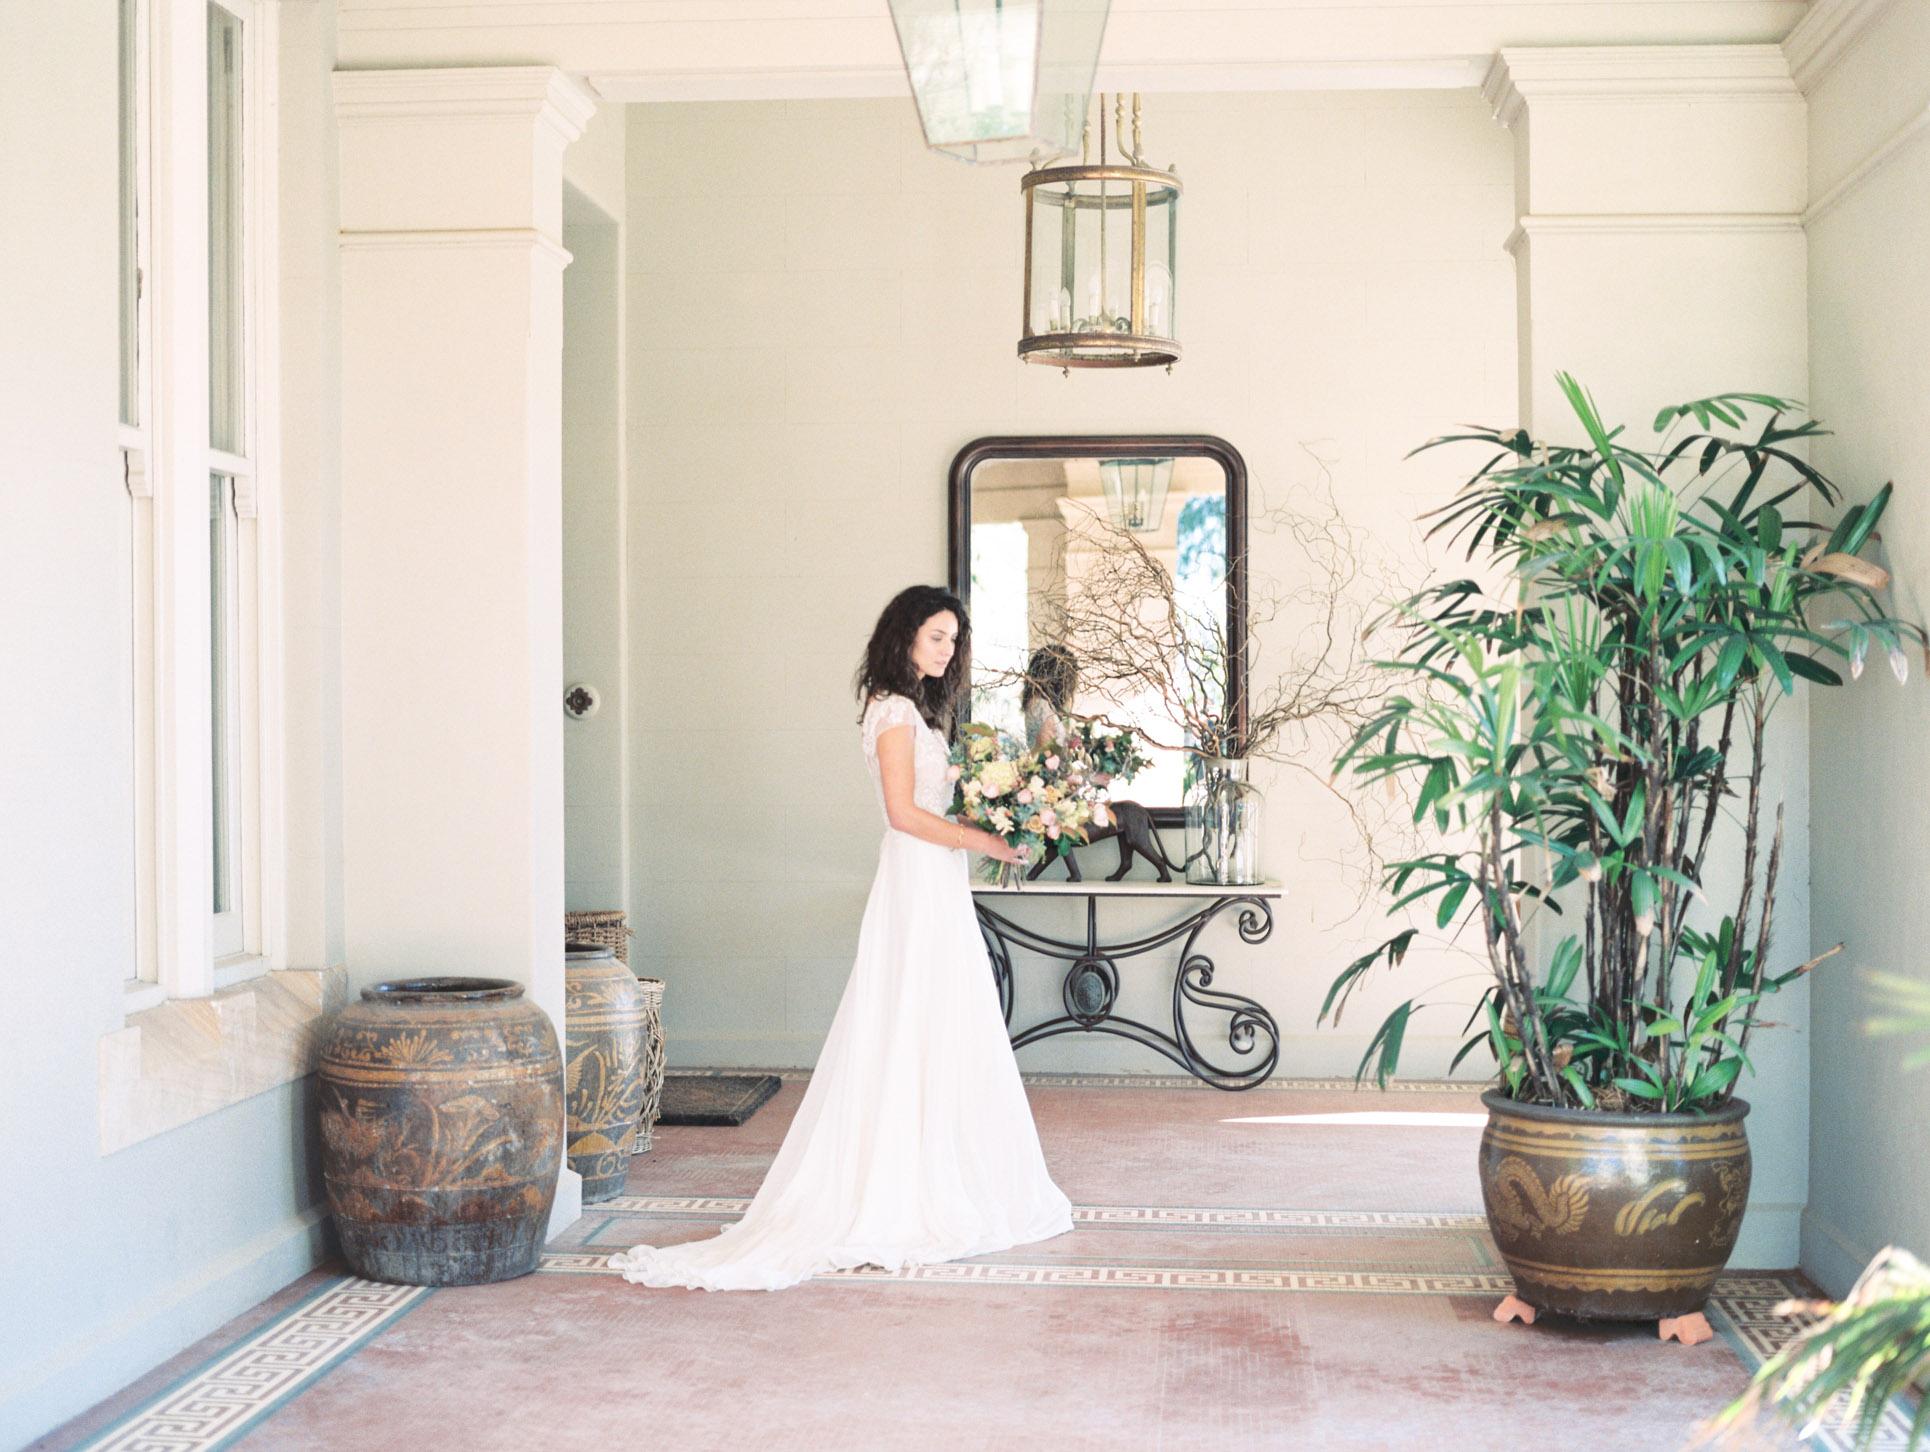 Hopewood House - Romantic Winter Wedding Shoot - Lilli Kad Photography - Shot - Residence Verandah.jpeg